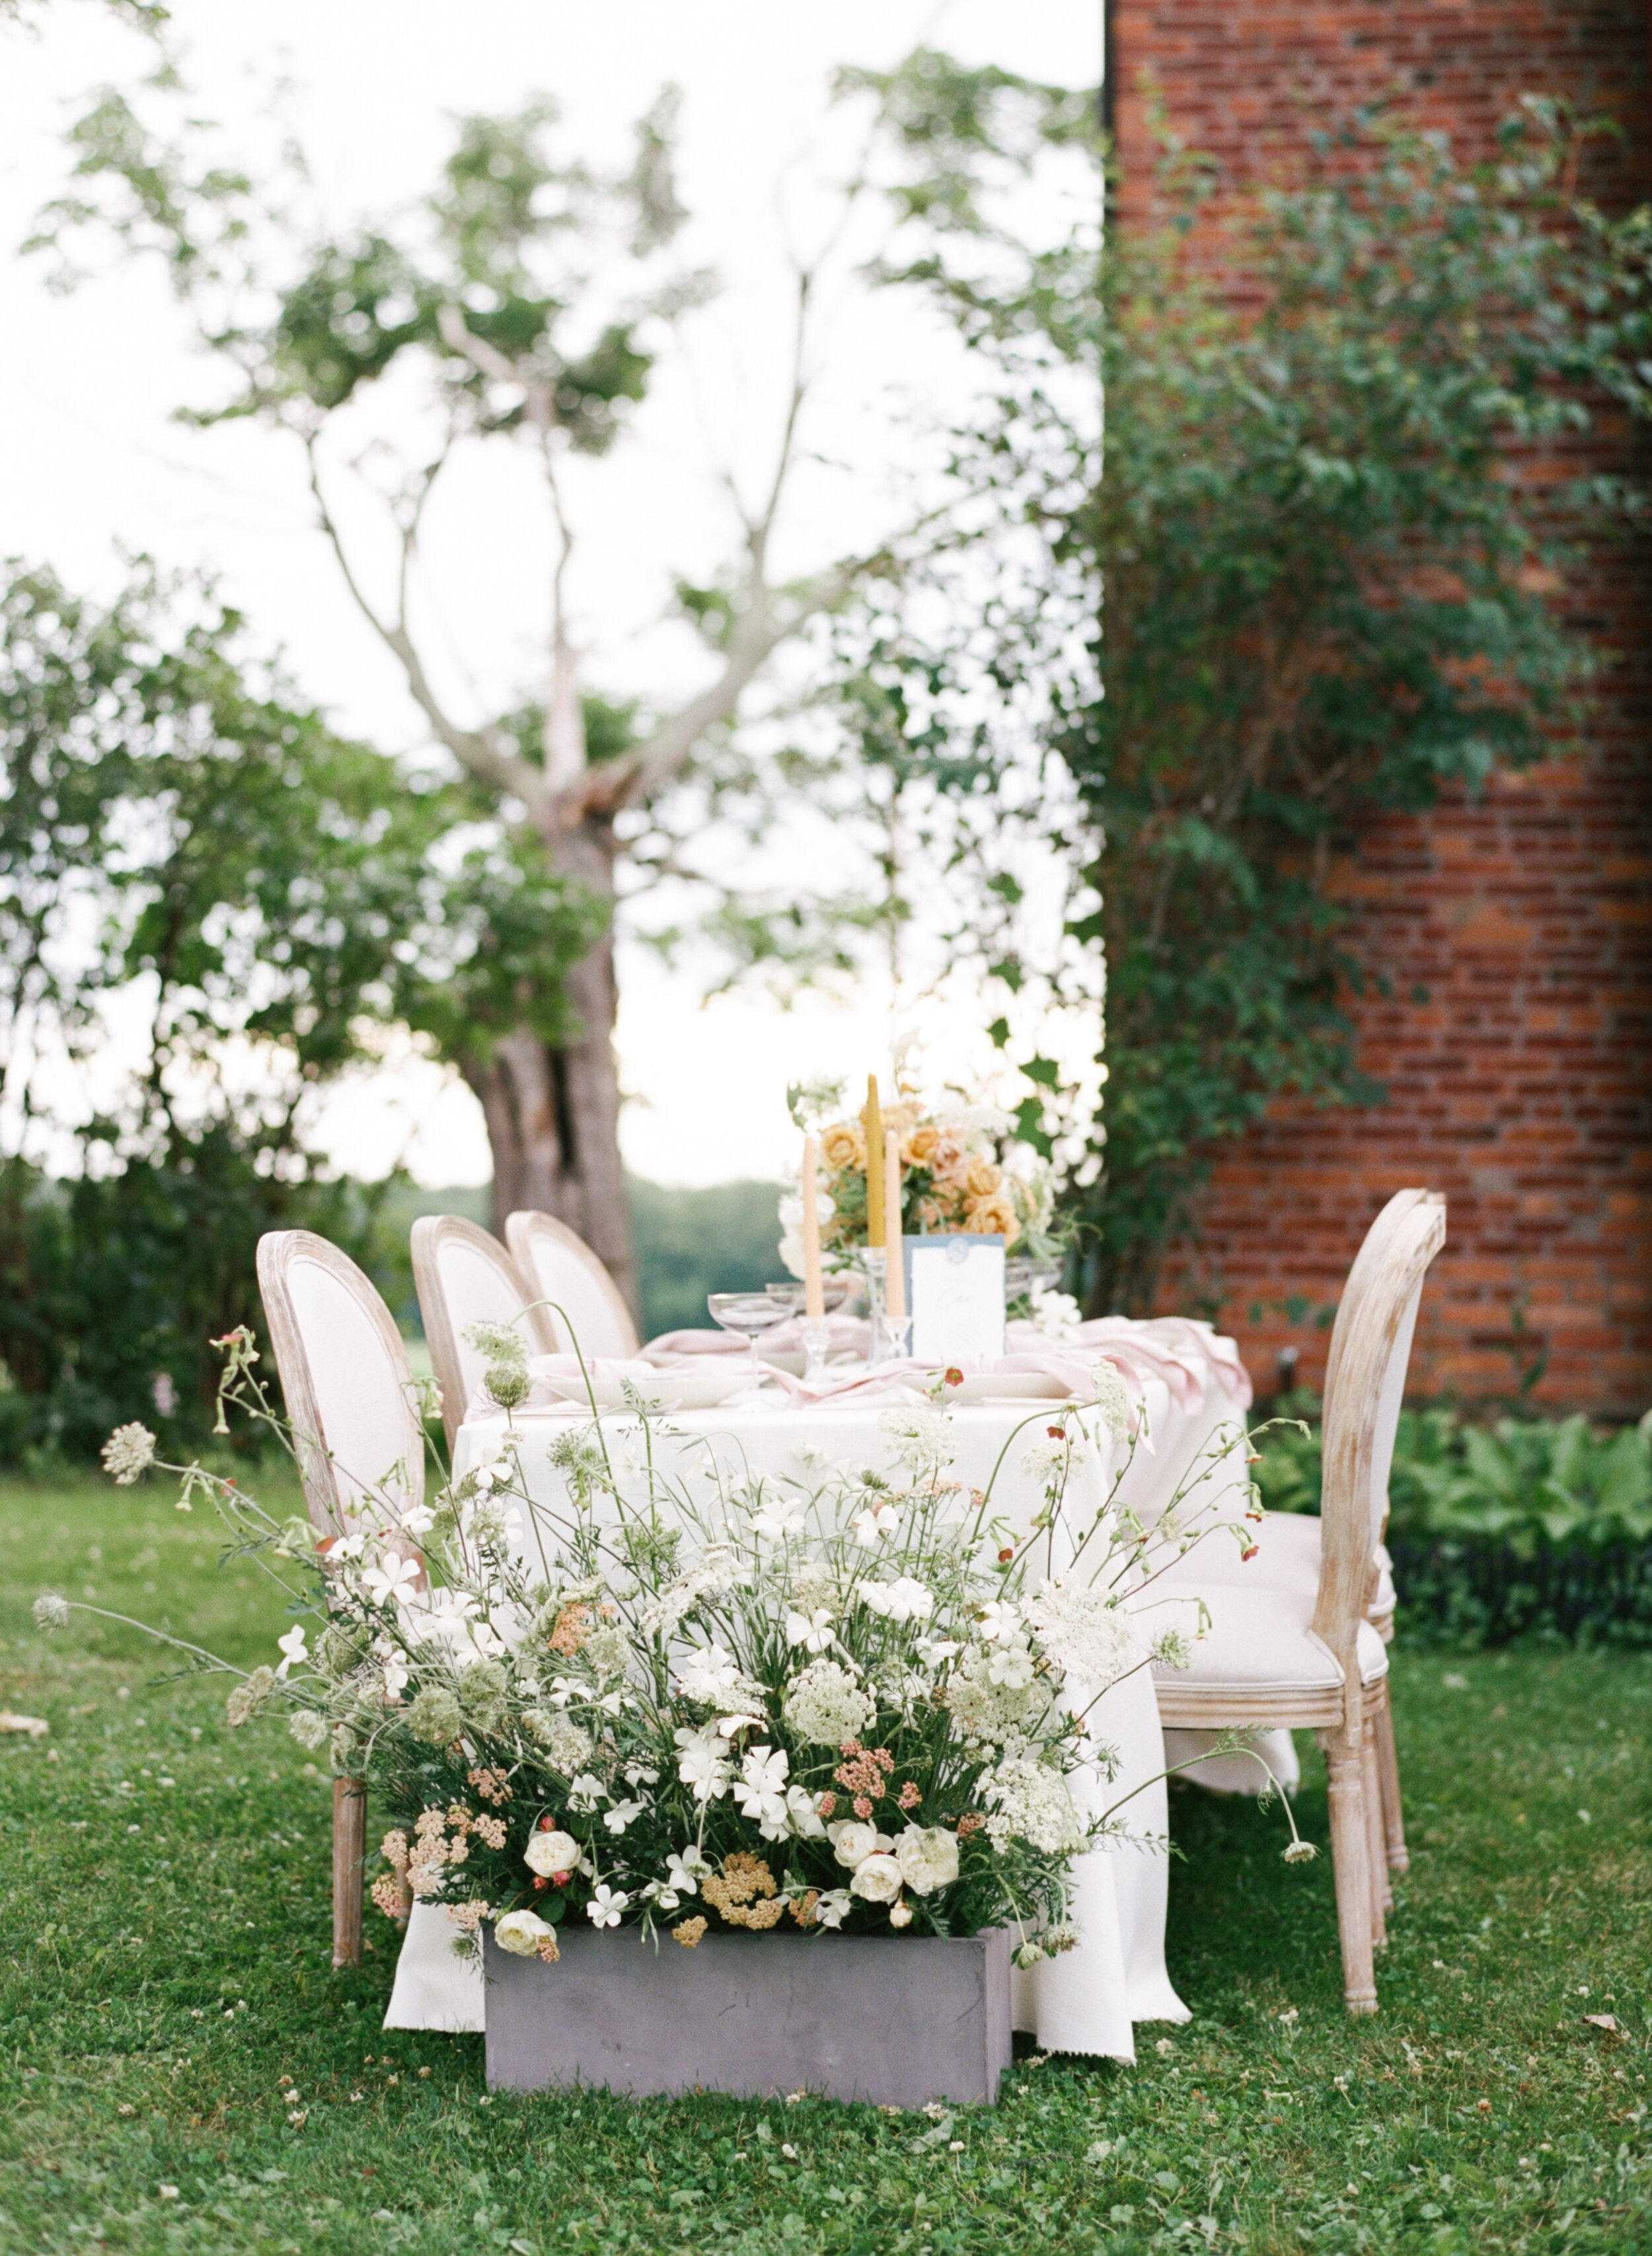 alexandra-meseke-understated-soft-luxury-wedding-upstate-ny_0126.jpg